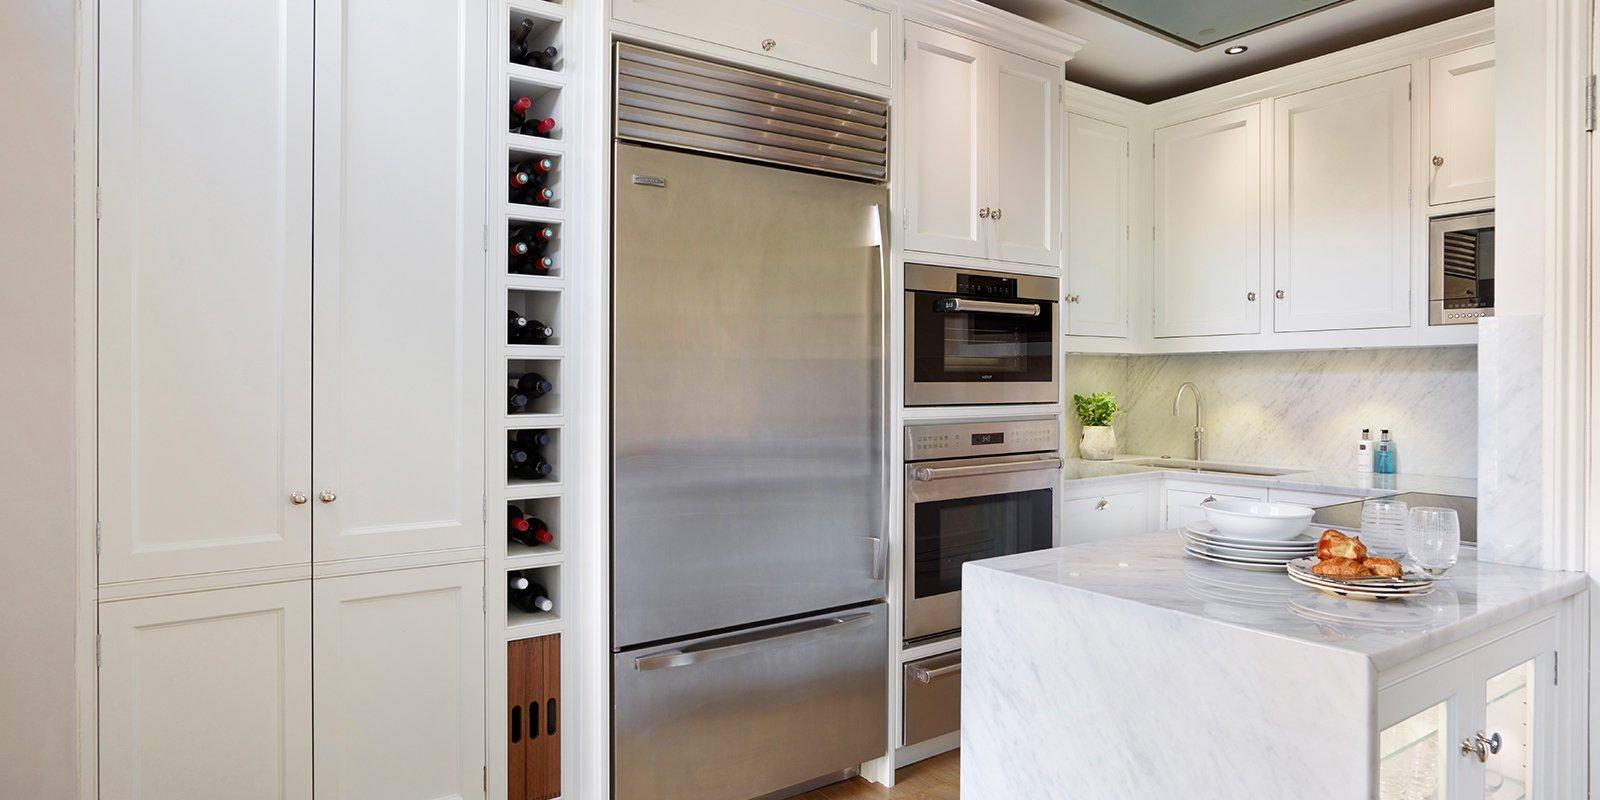 gally kitchen with sub zero fridge freezer